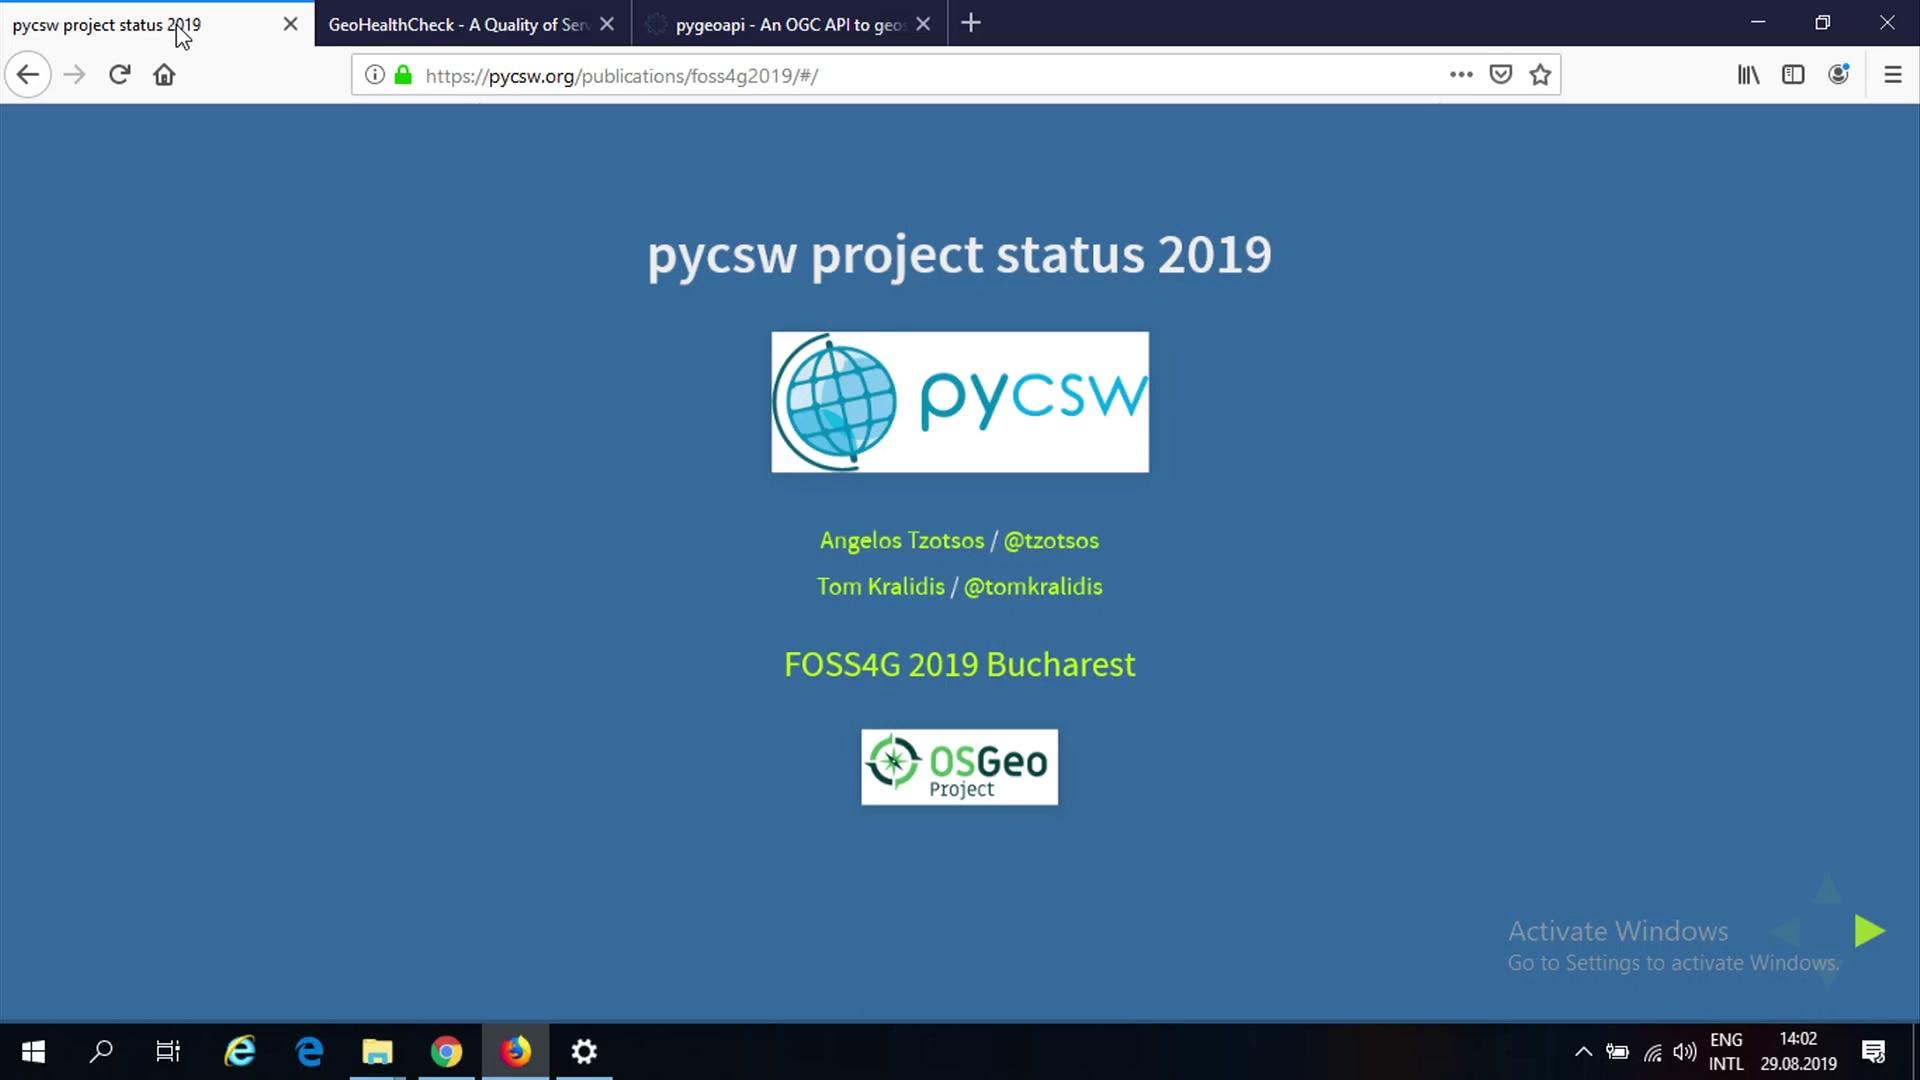 media ccc de - pycsw project status 2019